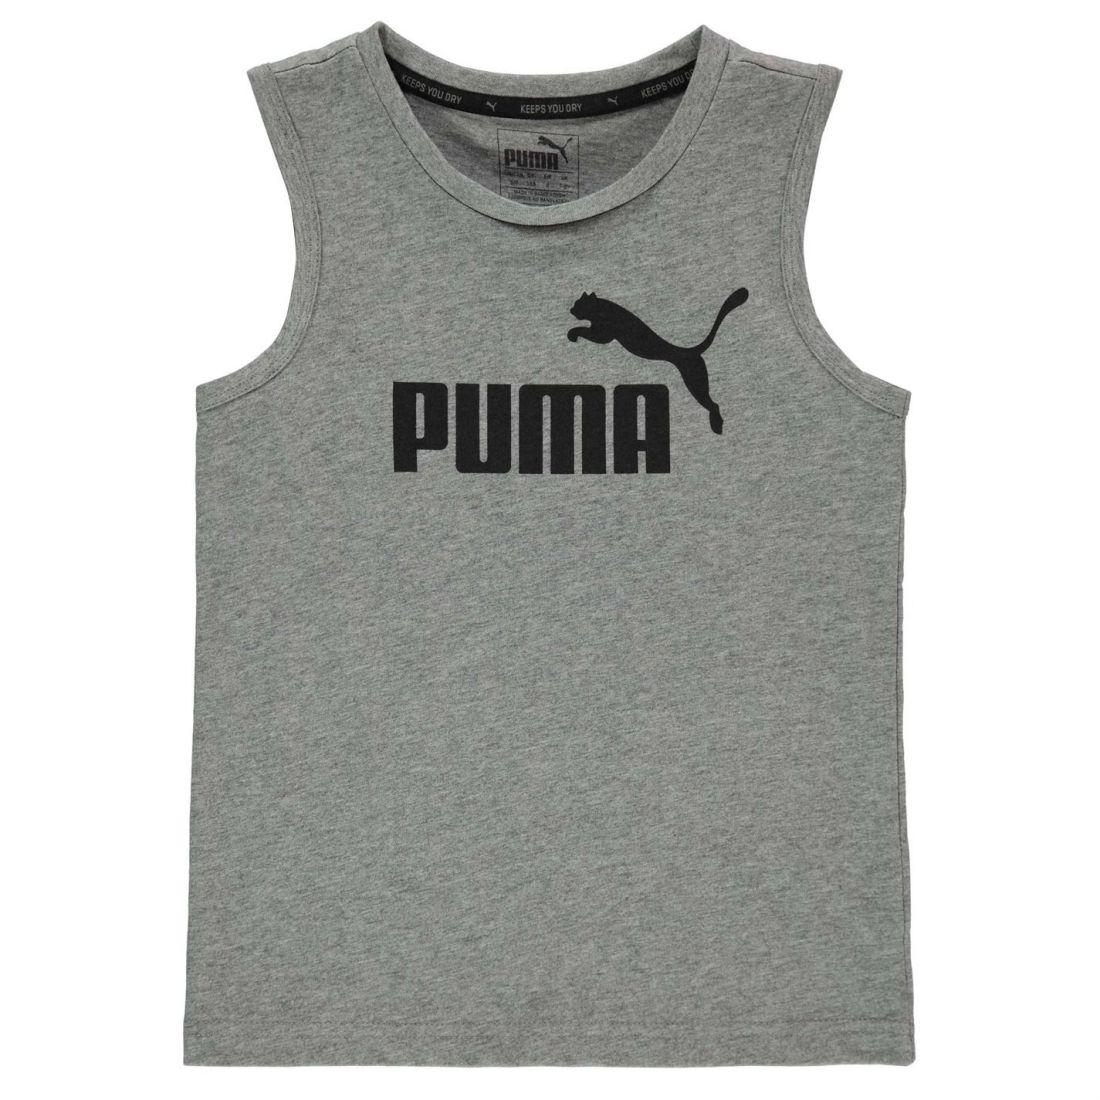 fbab0085cbc361 Puma Kids No1 Sleeveless T Shirt Tee Top Crew Neck Cotton Regular ...